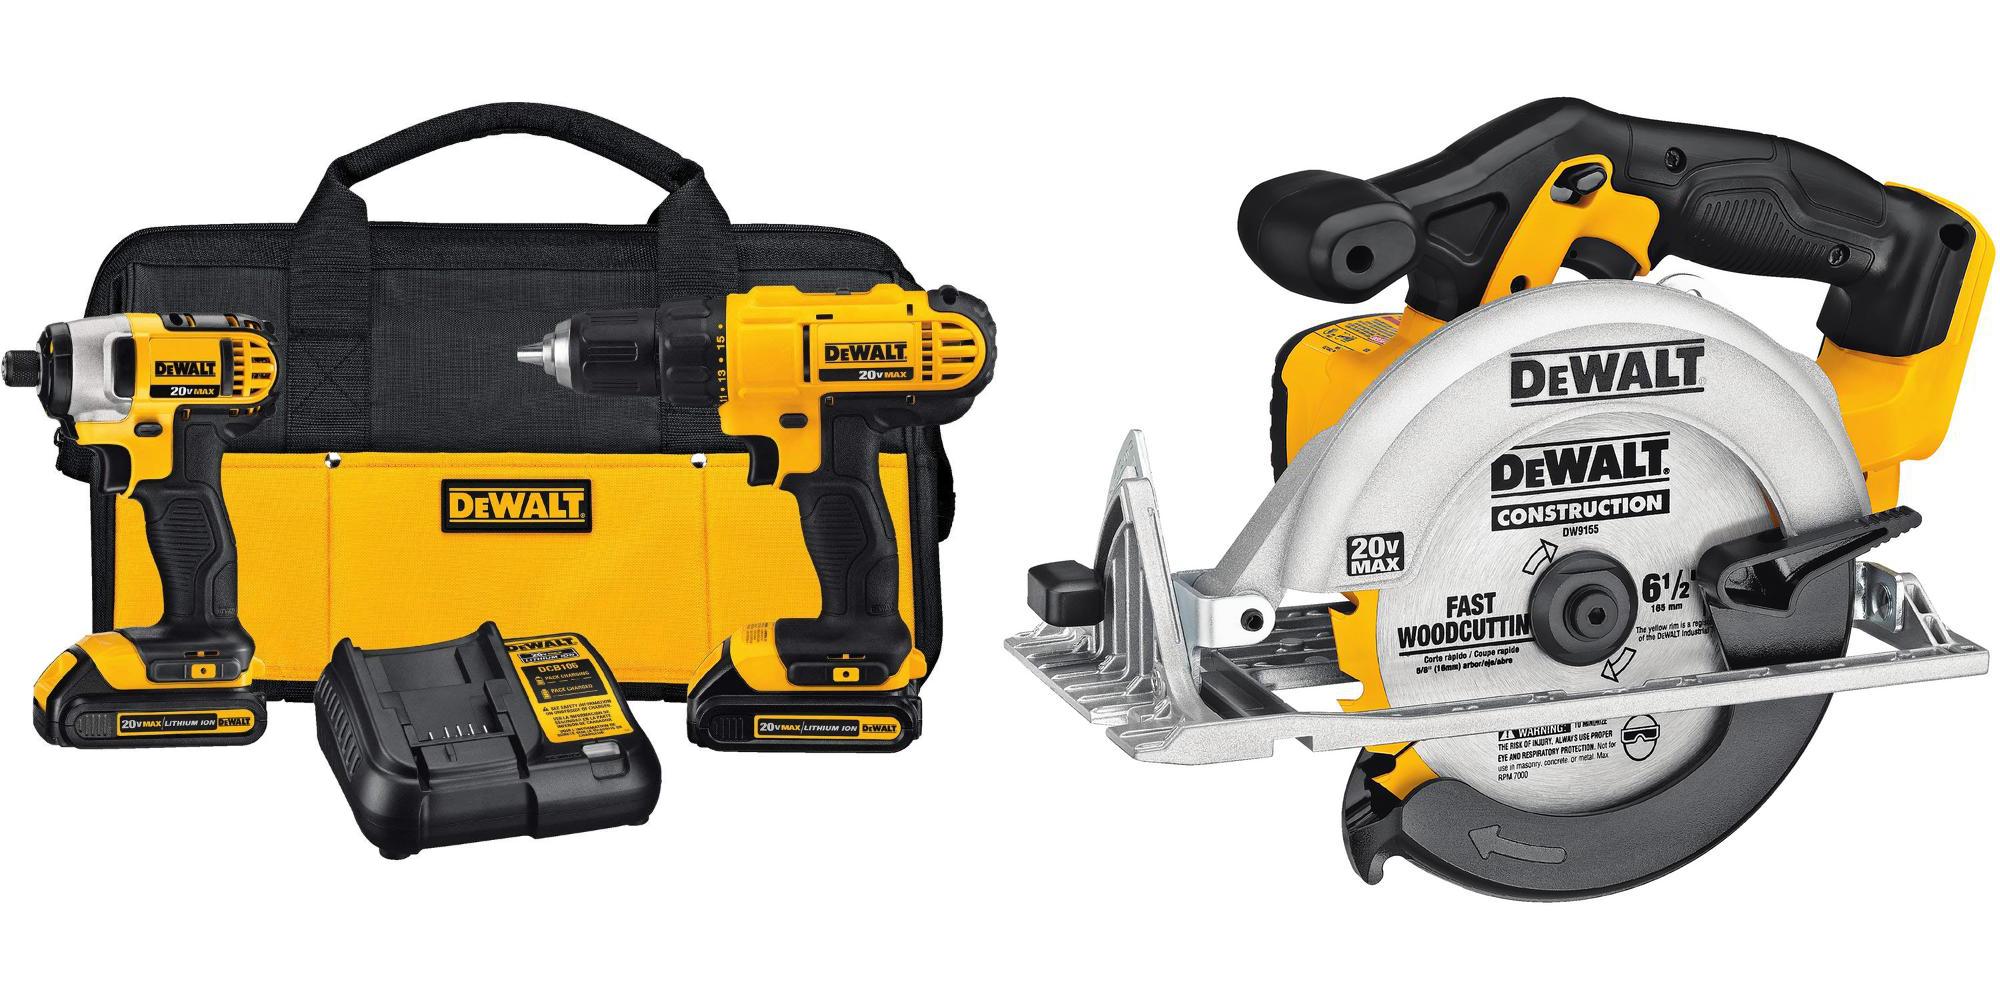 Save $75 off DEWALT's 20-Volt MAX Cordless 3-Tool Combo: $199 shipped